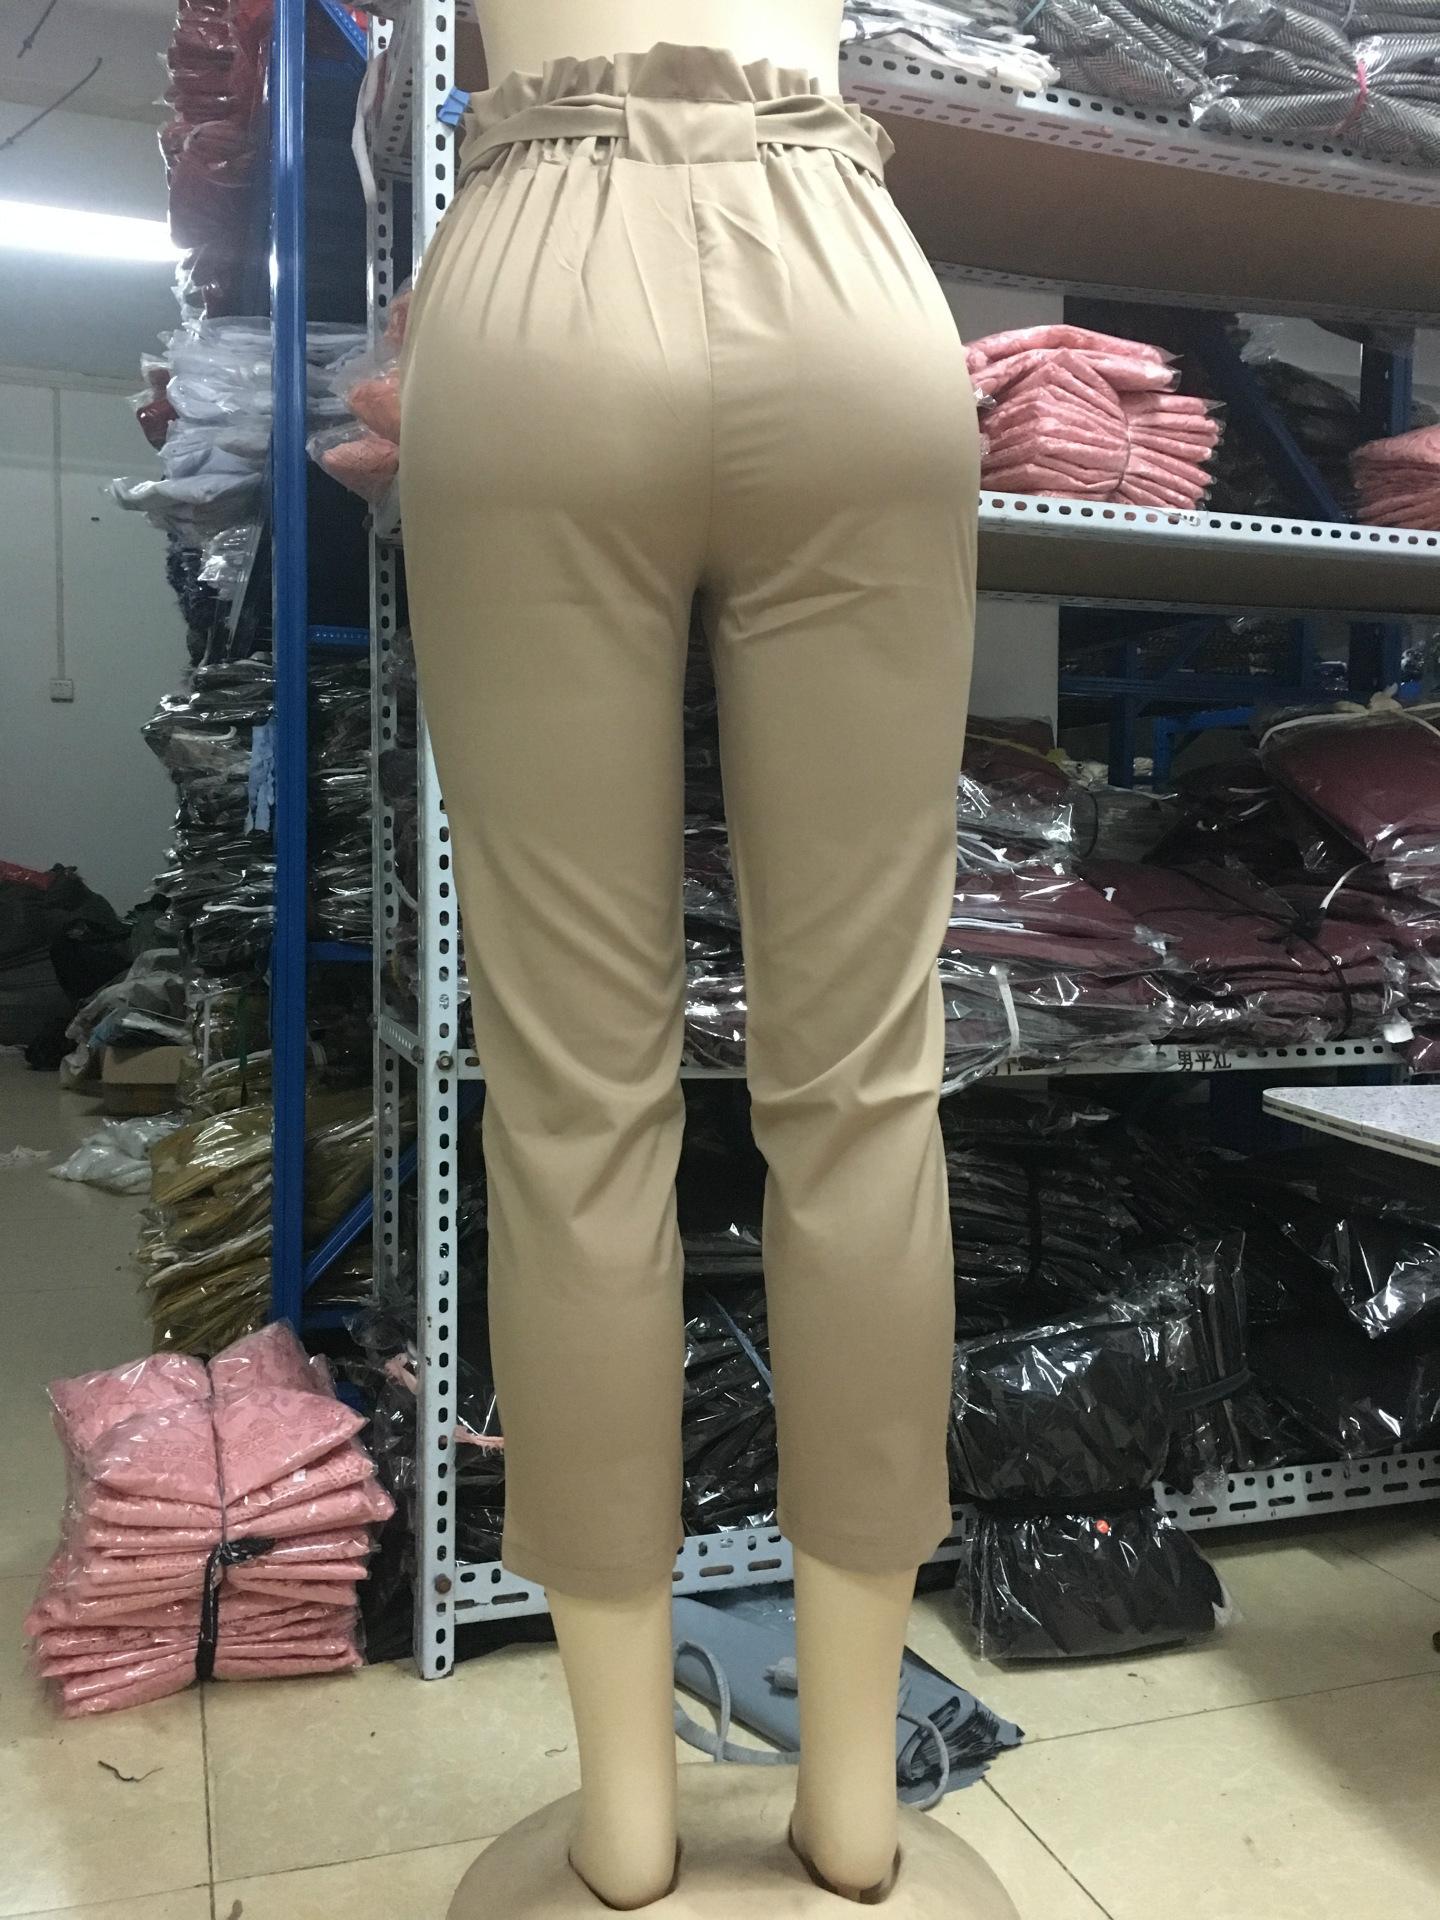 19 New Brand High Elastic Waist Harem Pants Women Spring Summer Fashion Ninth Pants Female Office Lady Black Trousers Belt 12